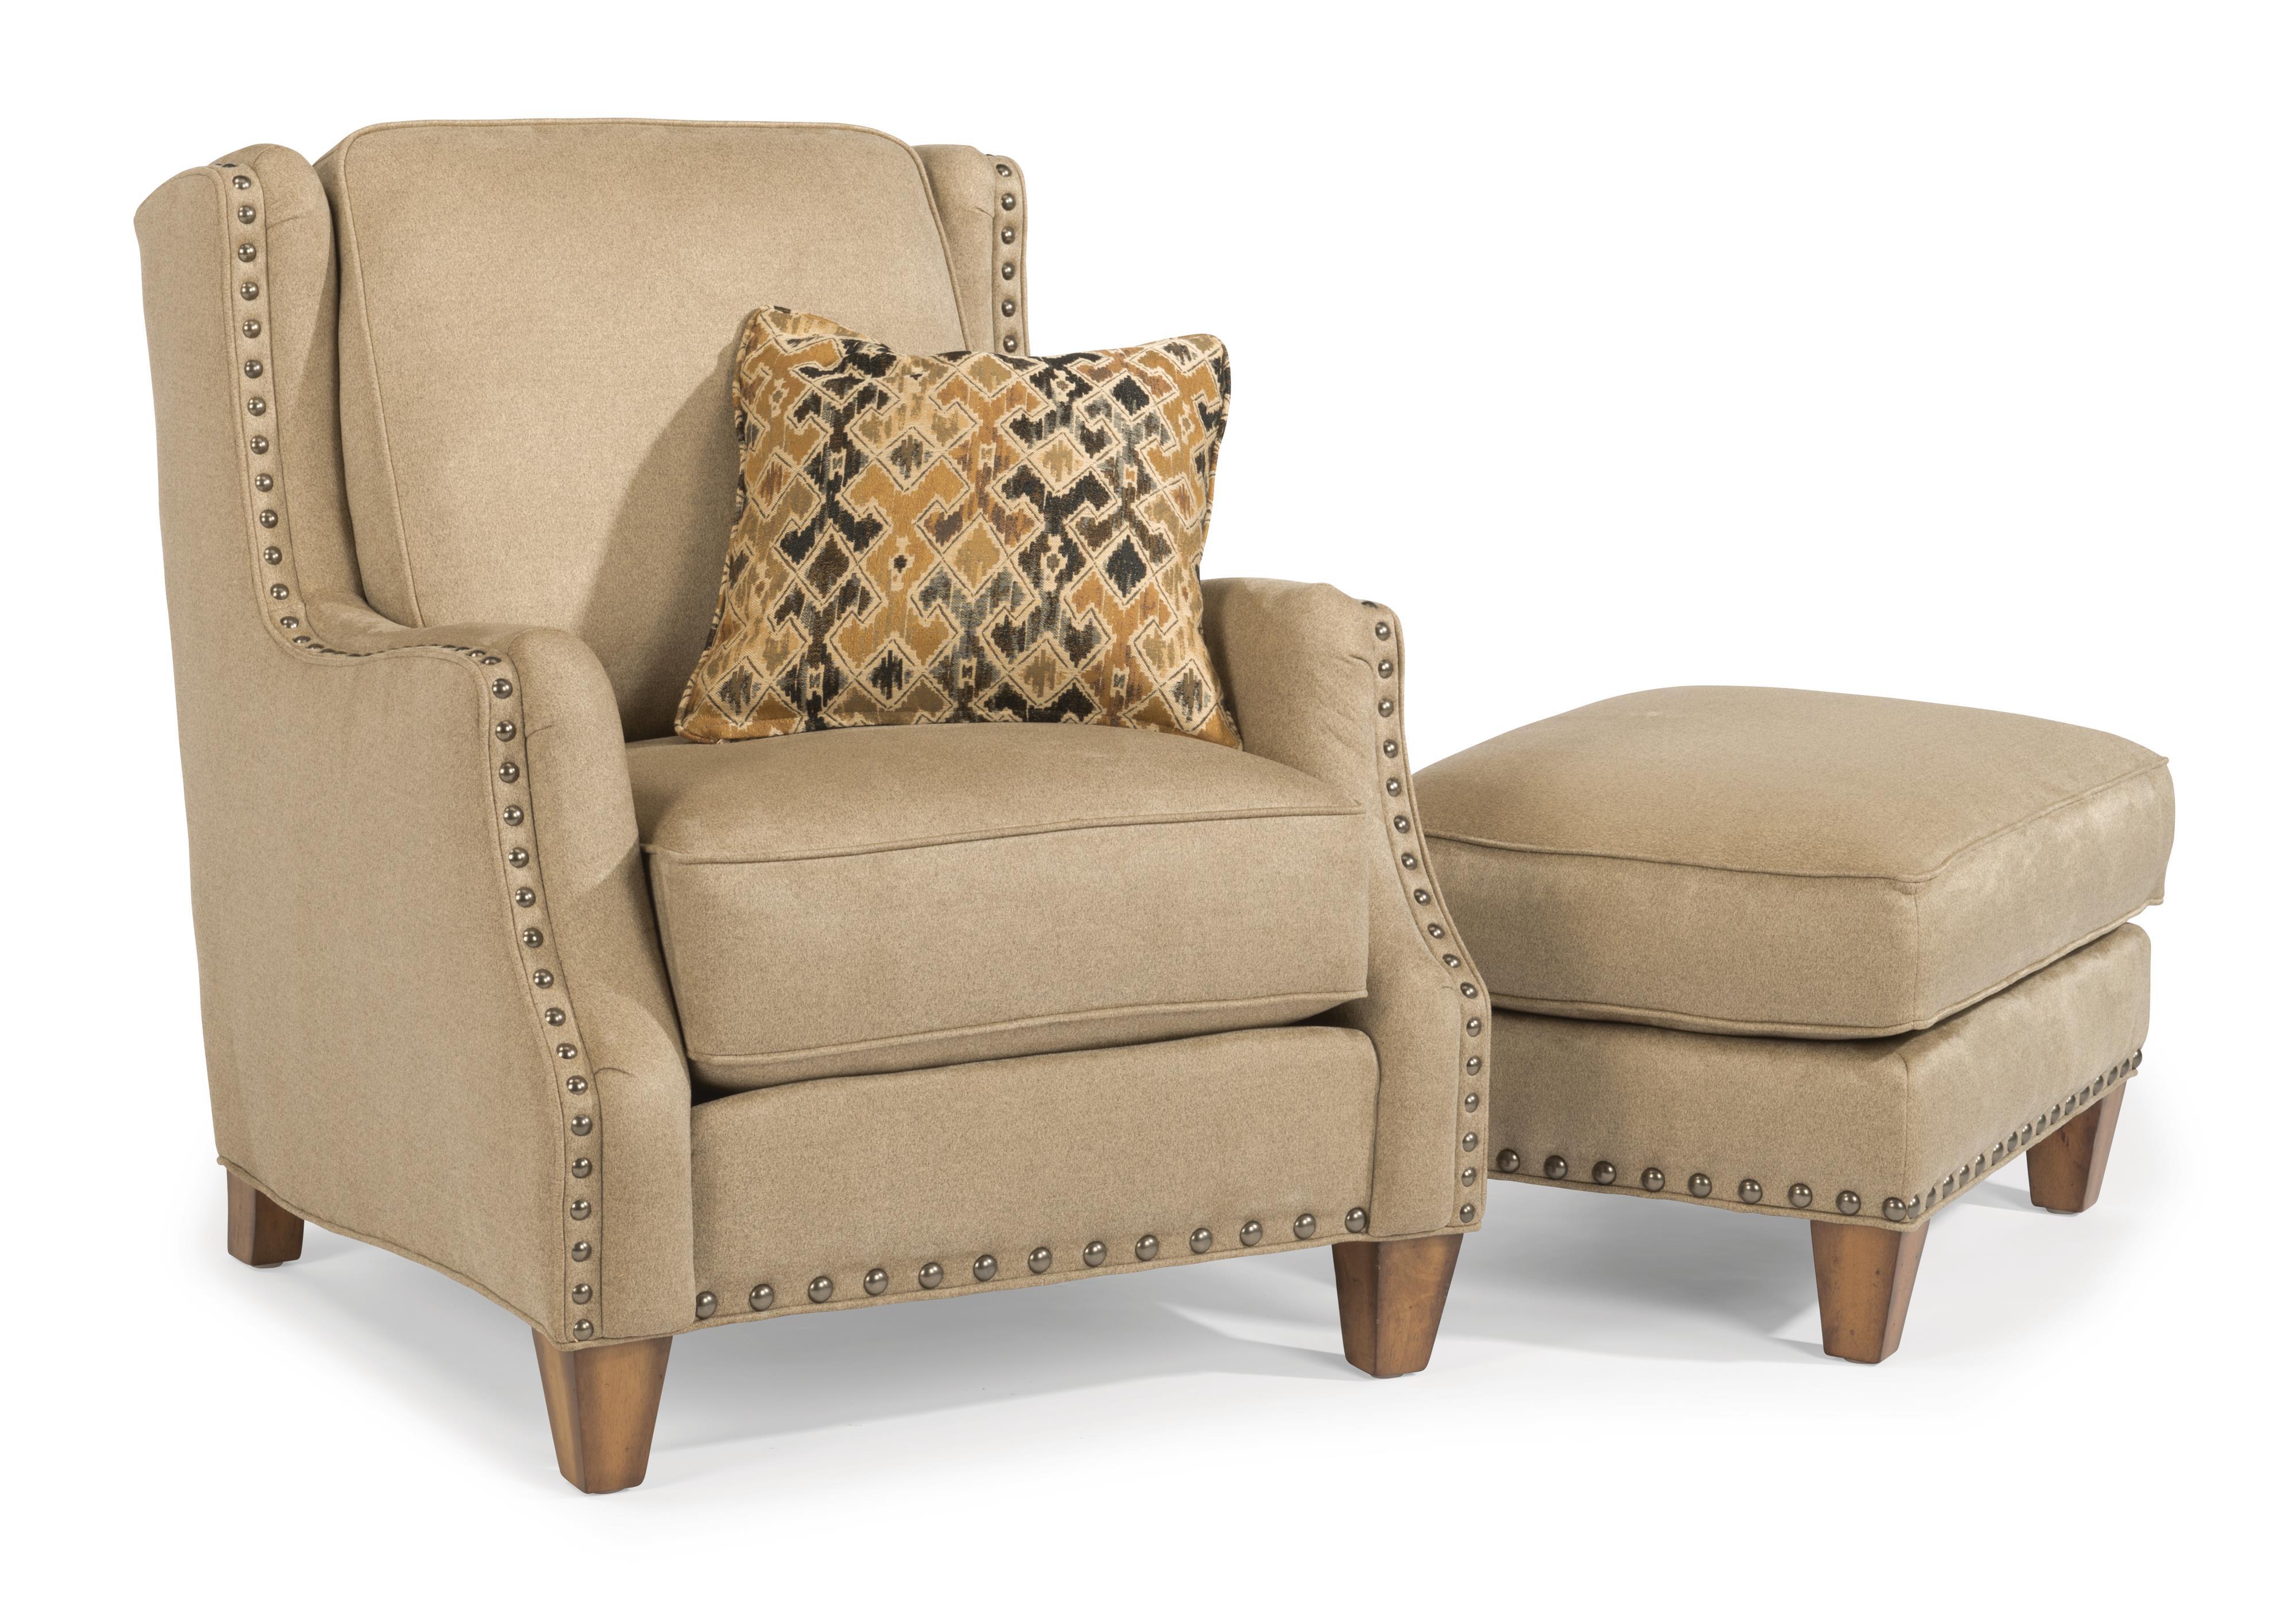 Flexsteel Conrad Chair & Ottoman Set - Item Number: 7813-10+7813-08-920-80